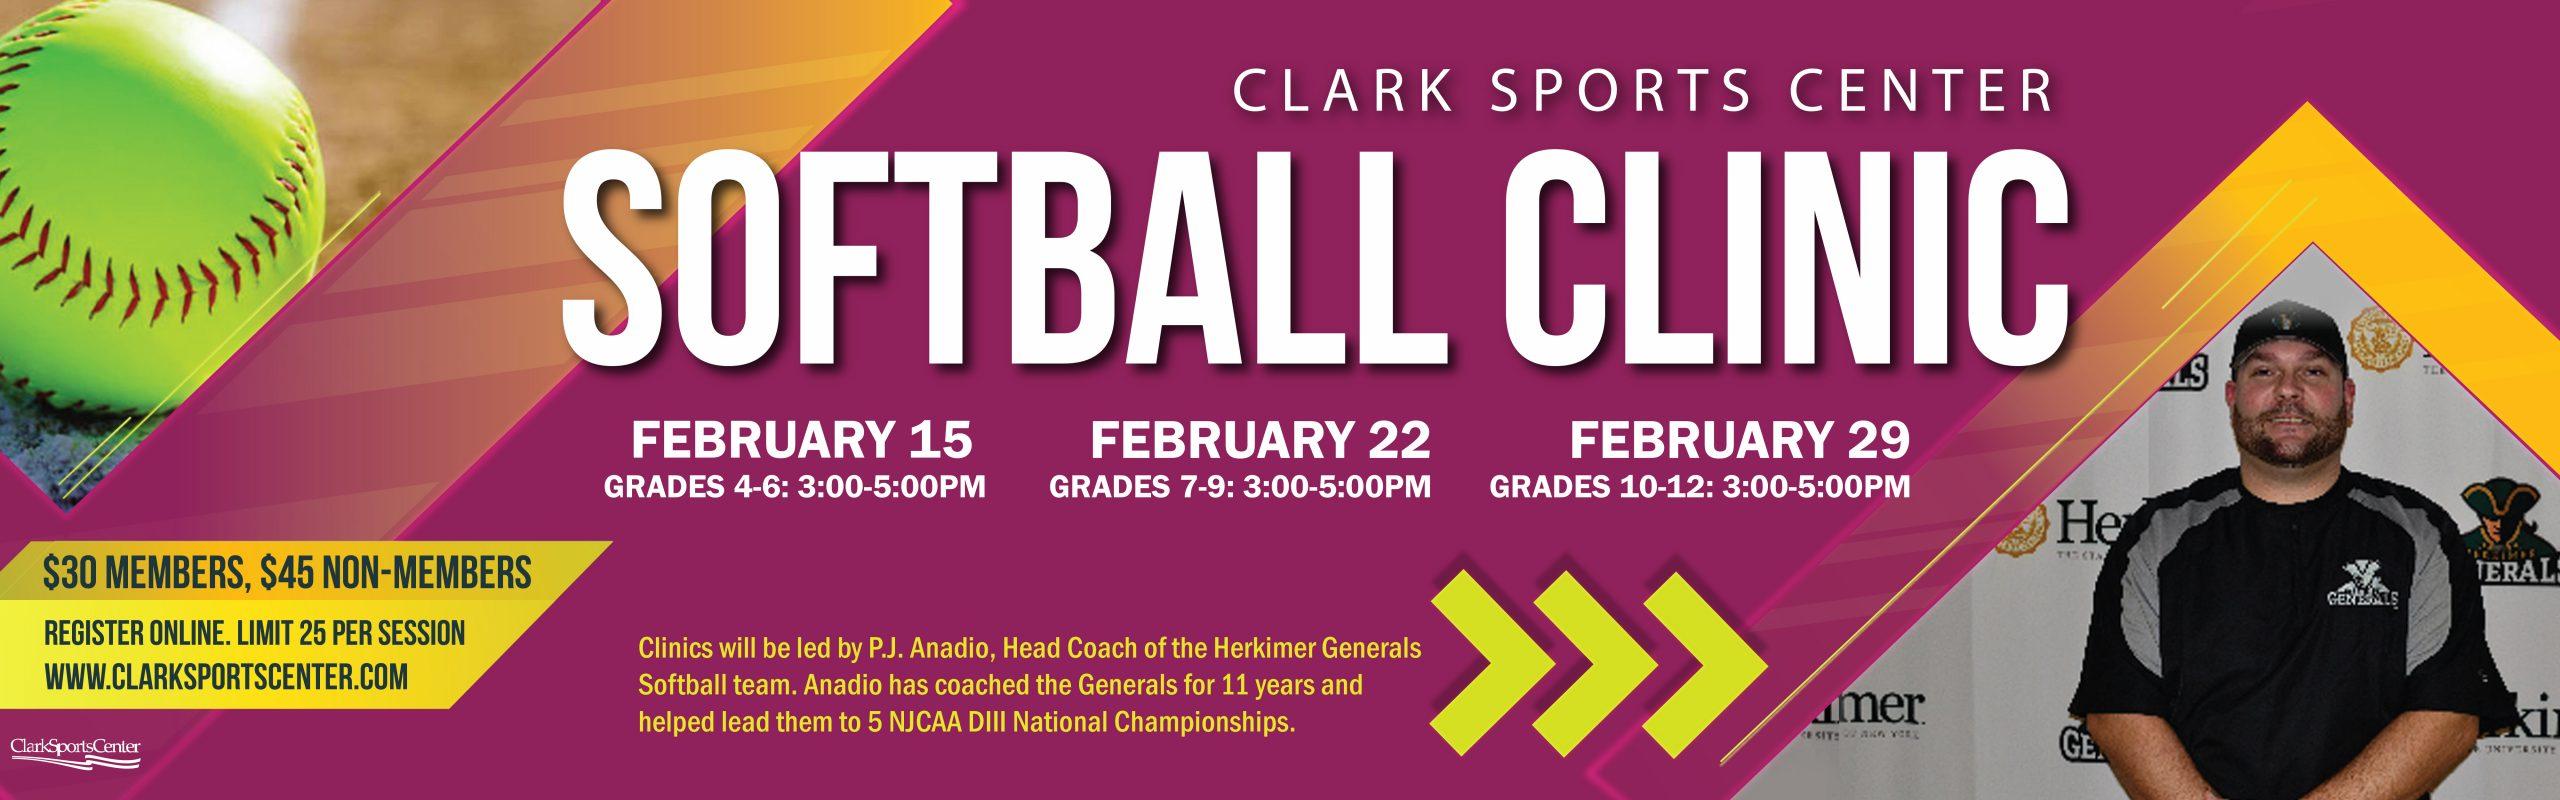 New! February Softball Clinics